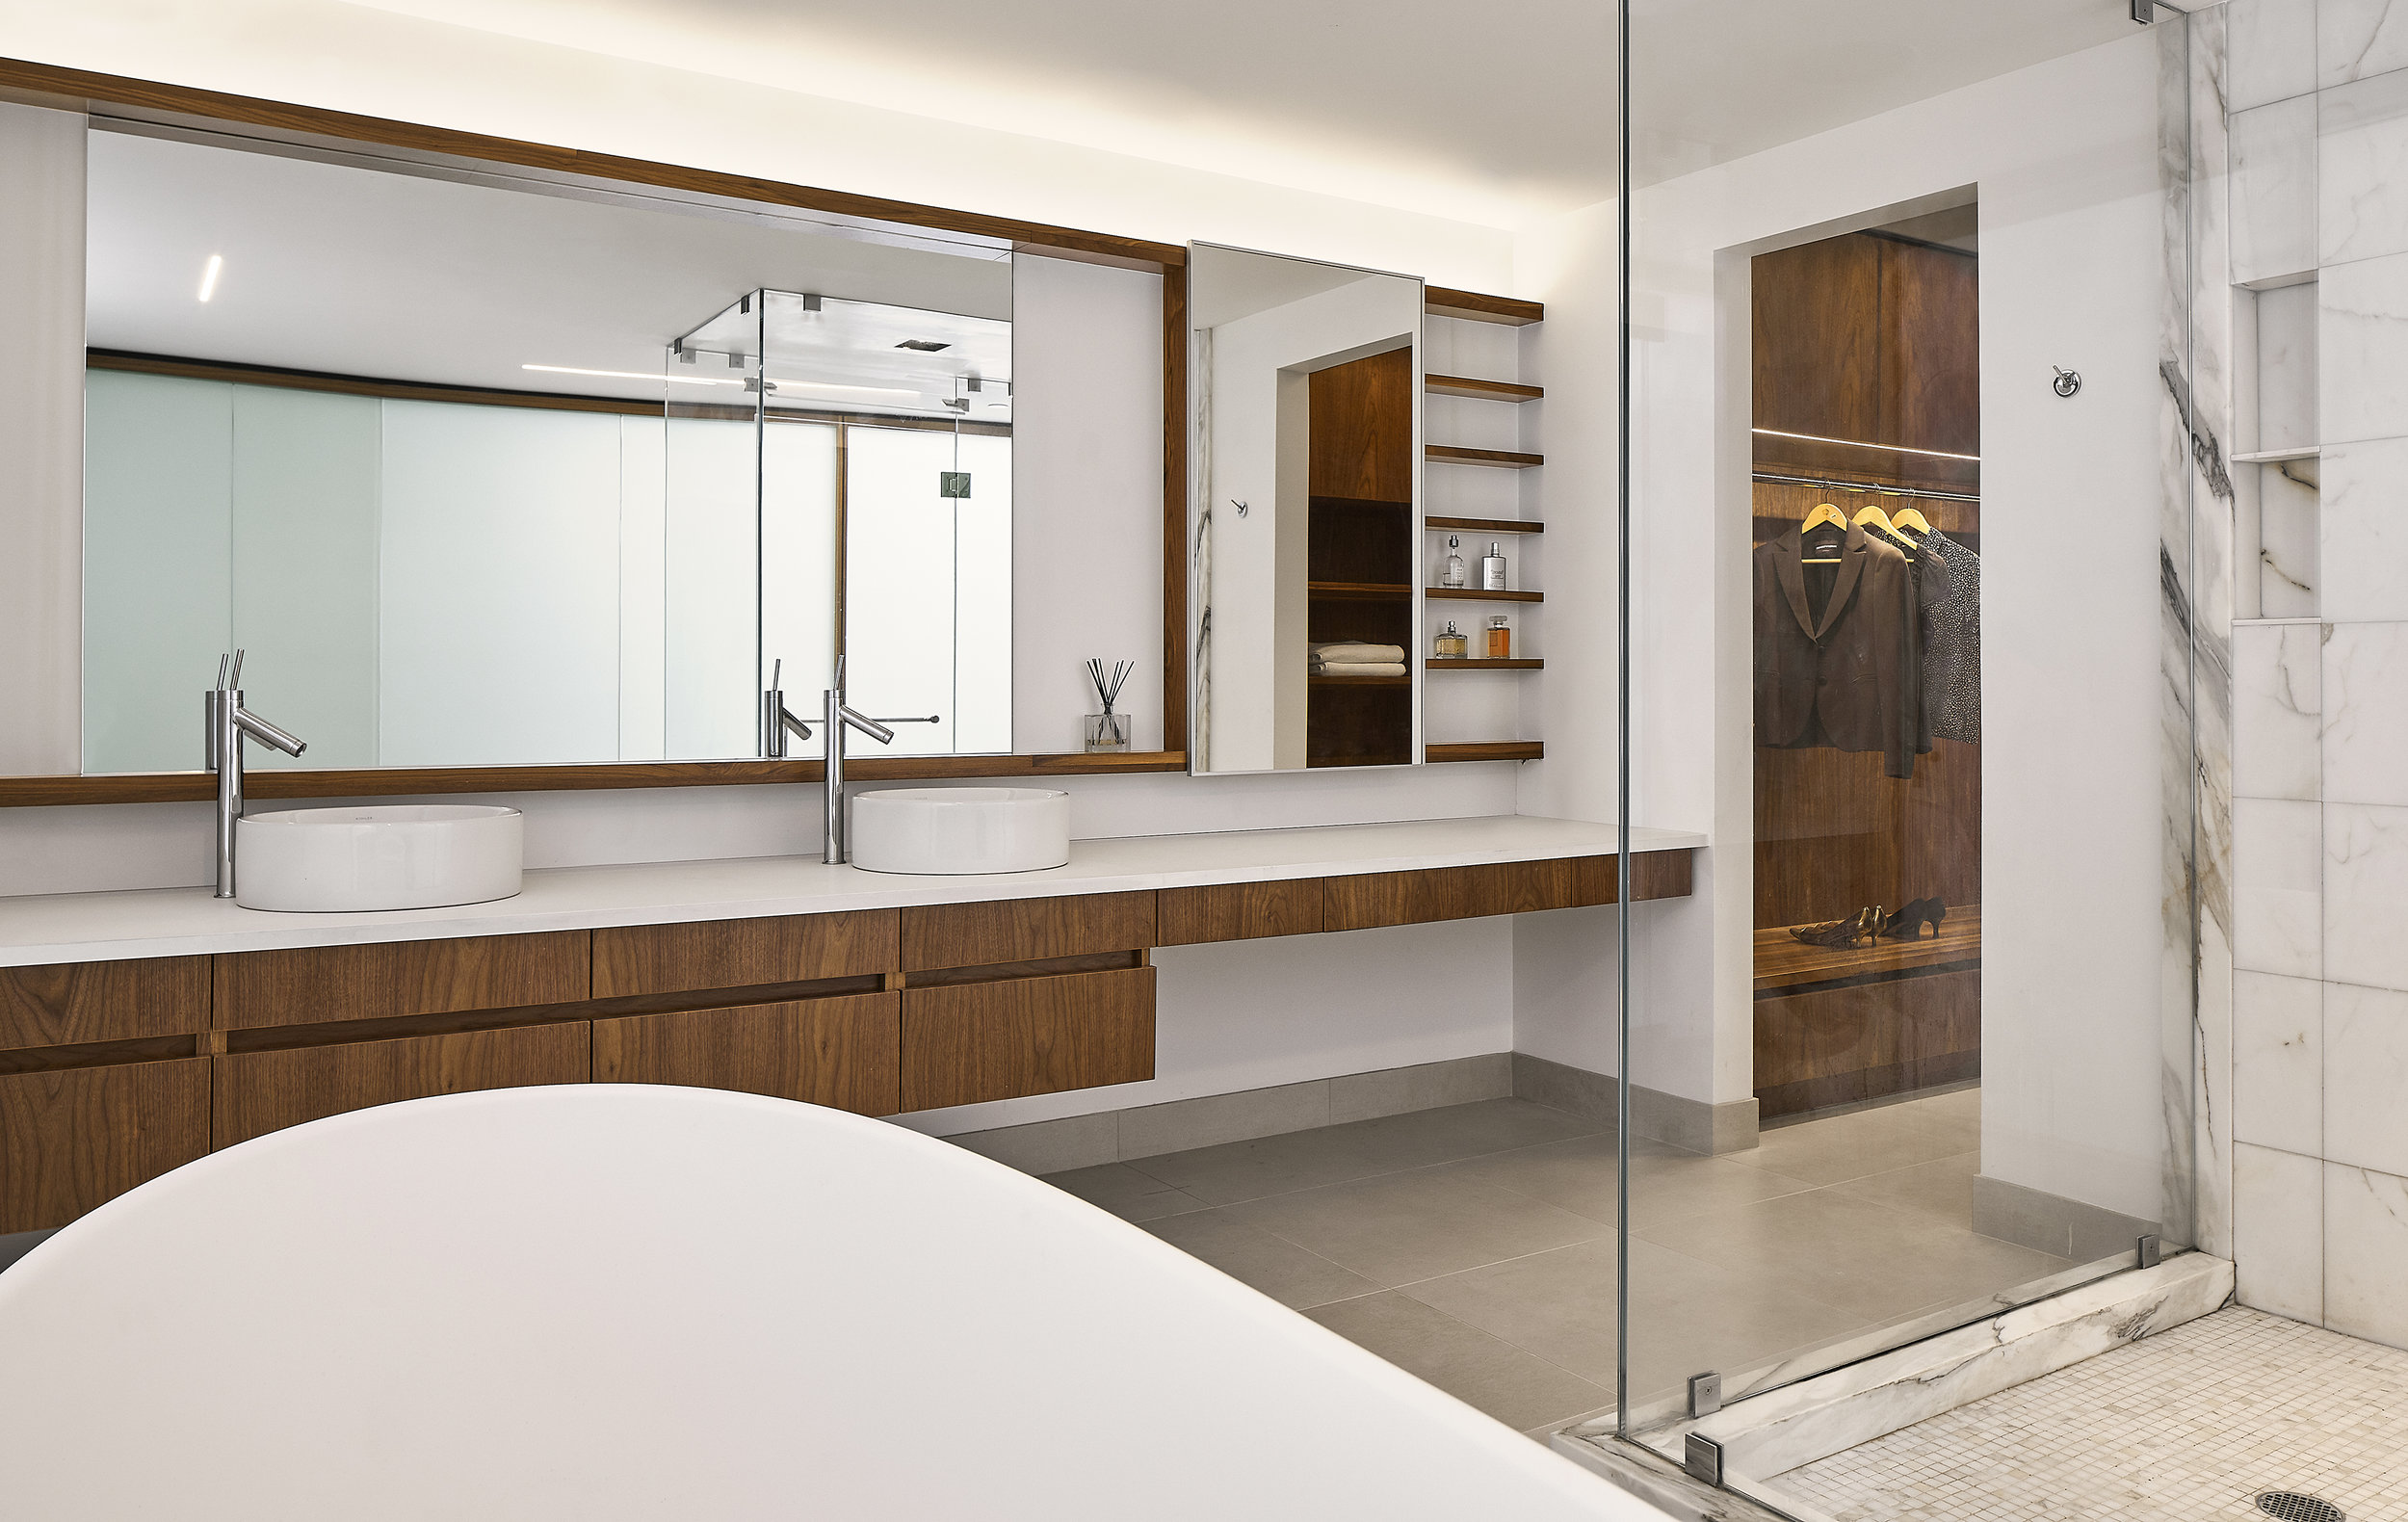 turkel_design_modern_prefab_home_soho_loft_bathroom.jpg